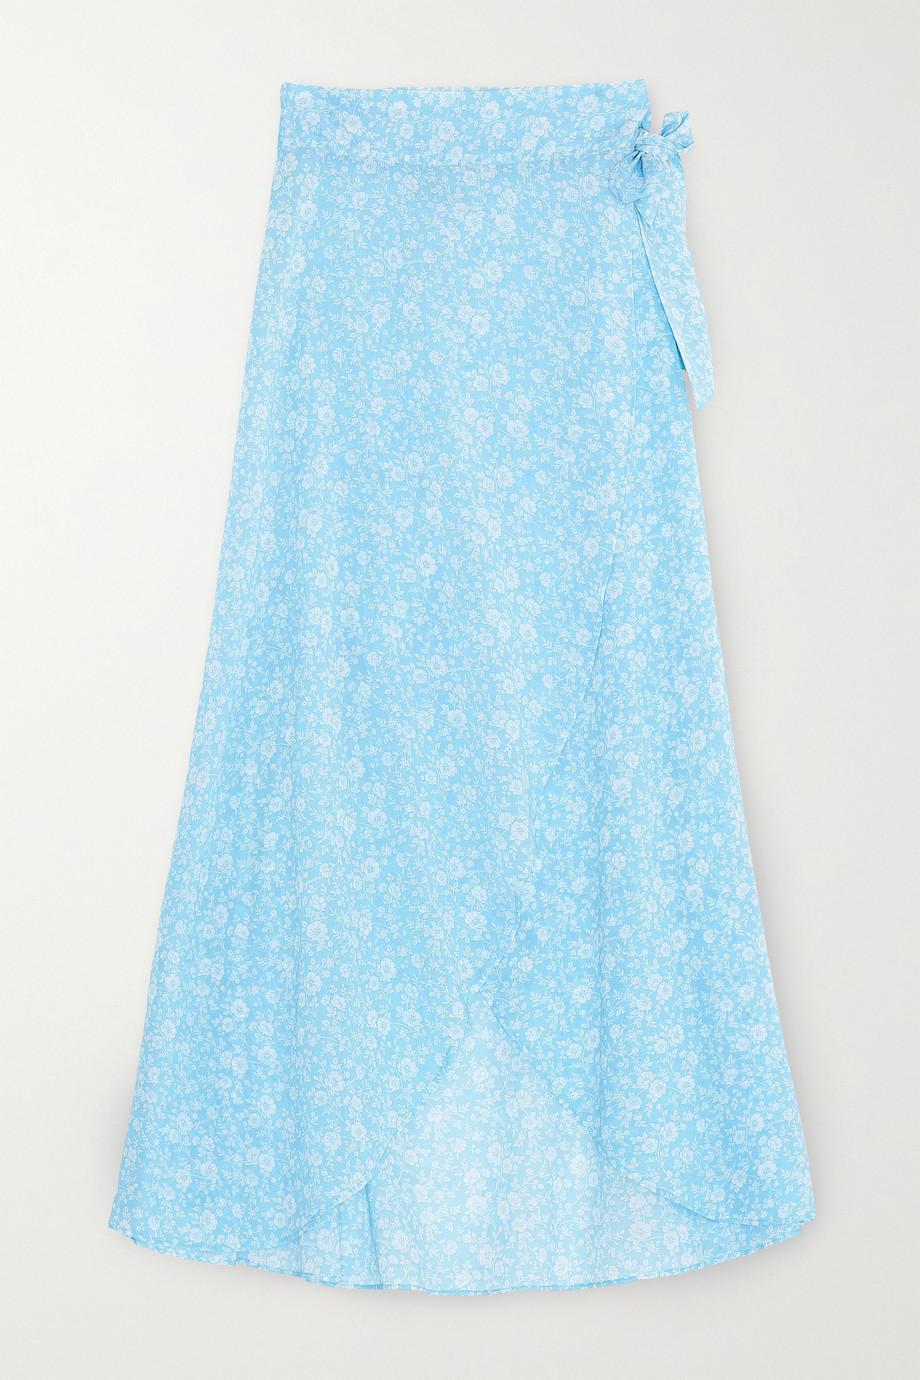 GANNI Floral-print cotton-voile wrap midi skirt